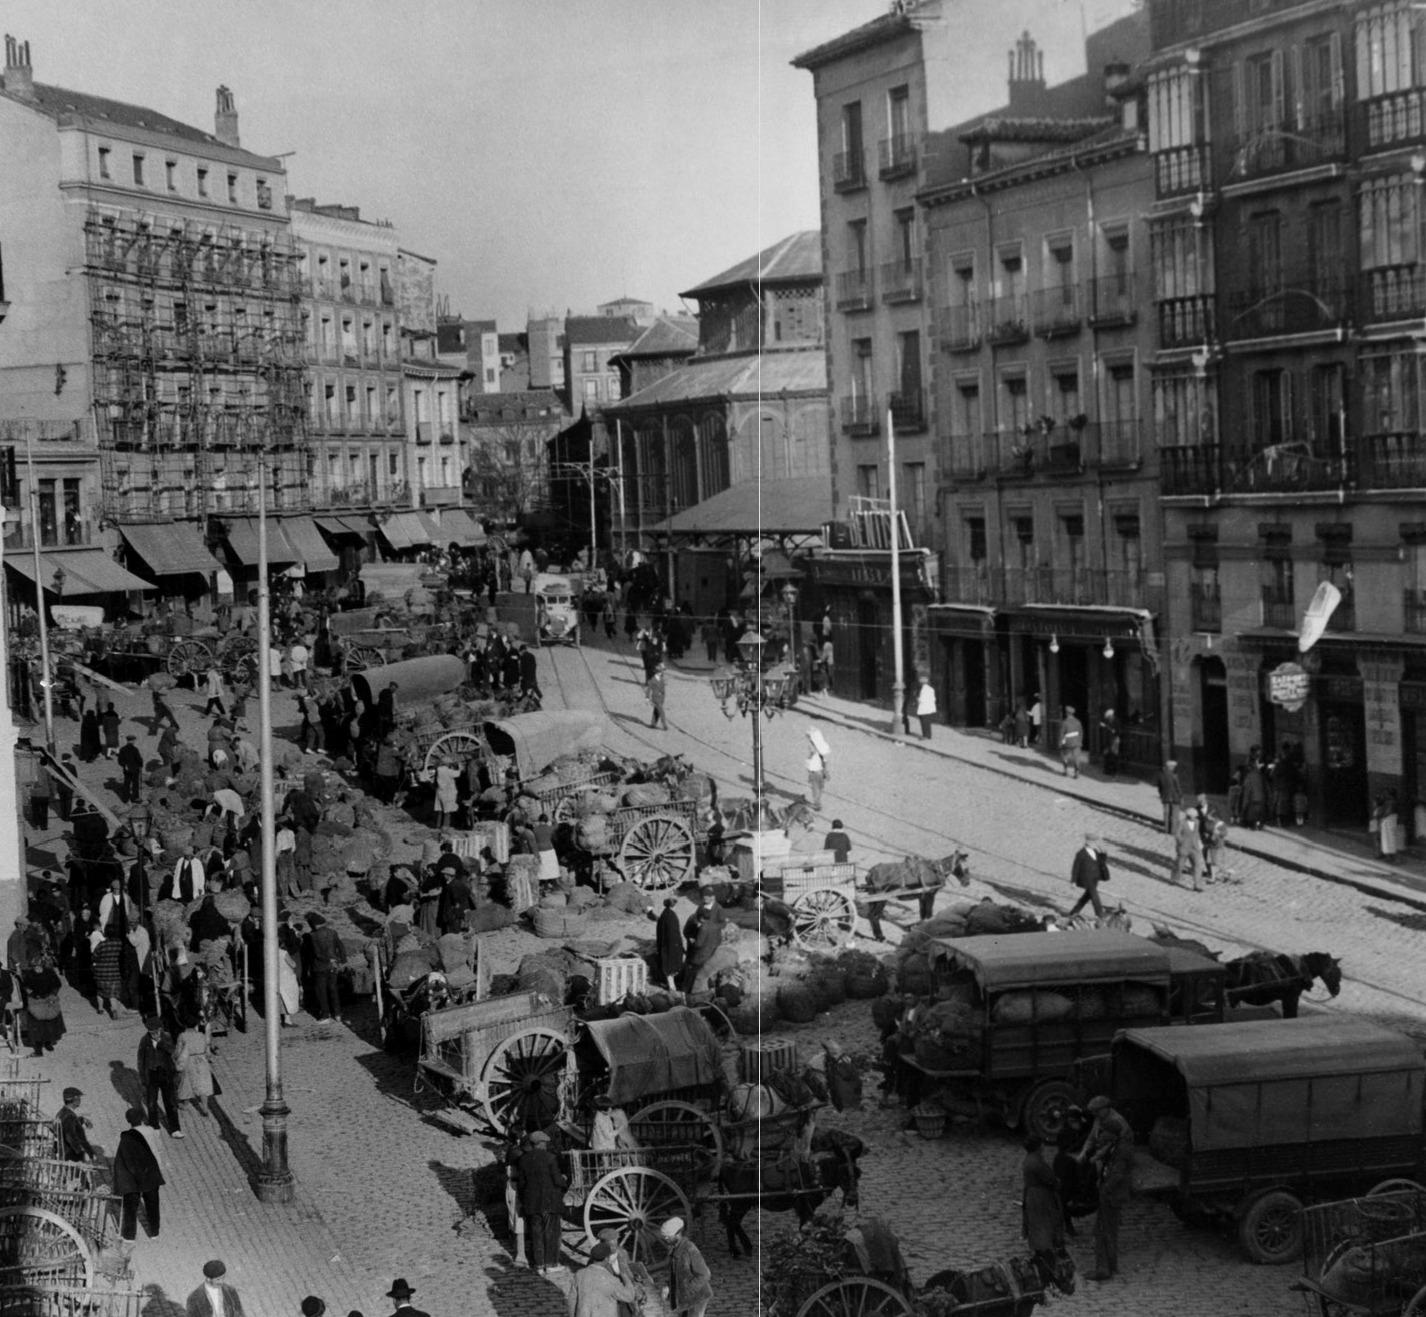 Plaza de la Cebada, 1929